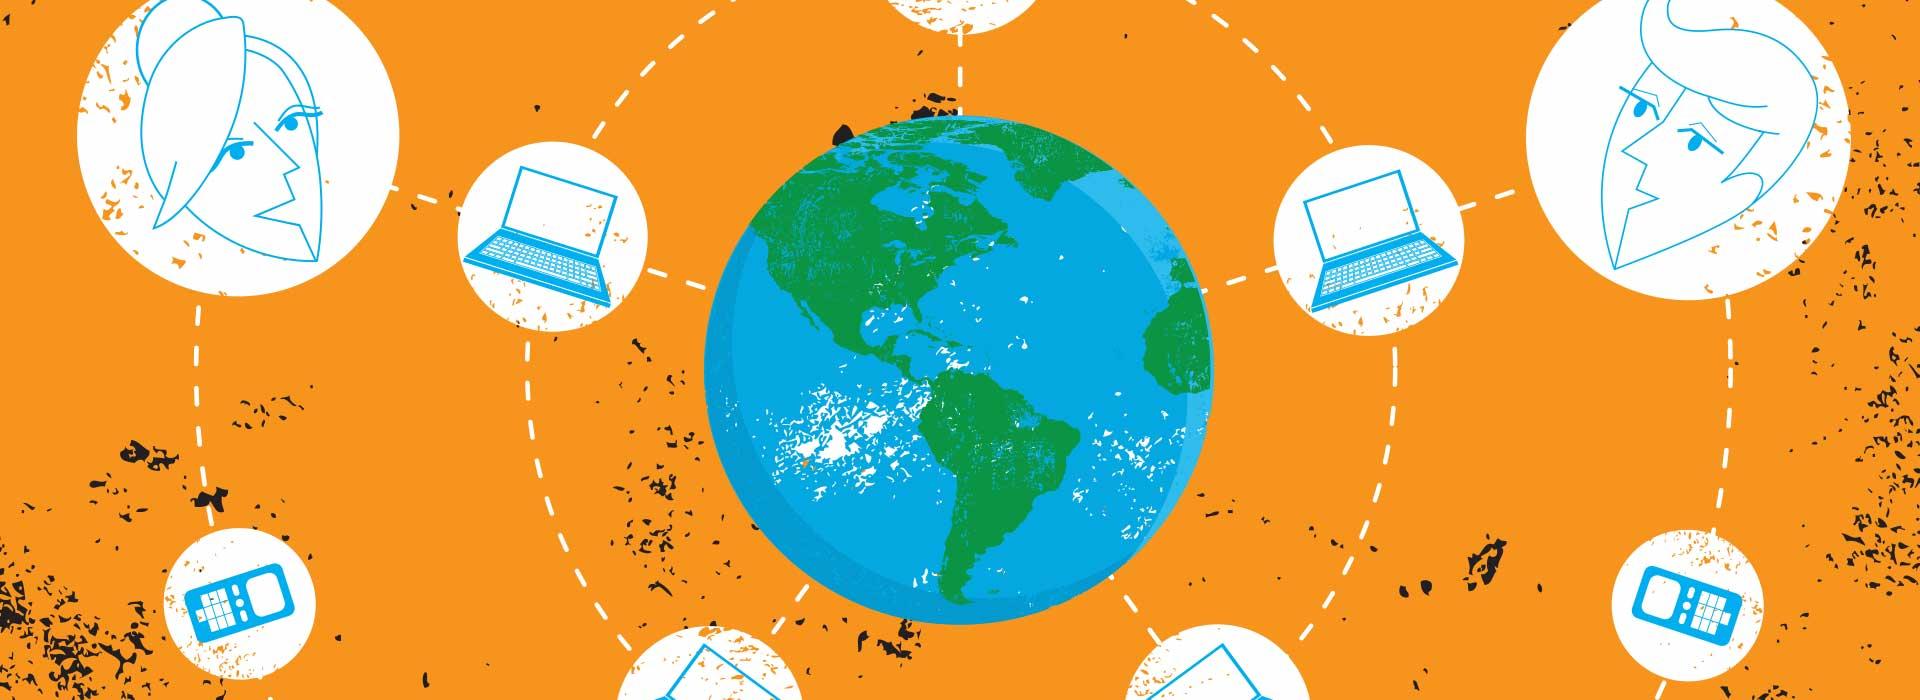 AISAP Partners Around the World